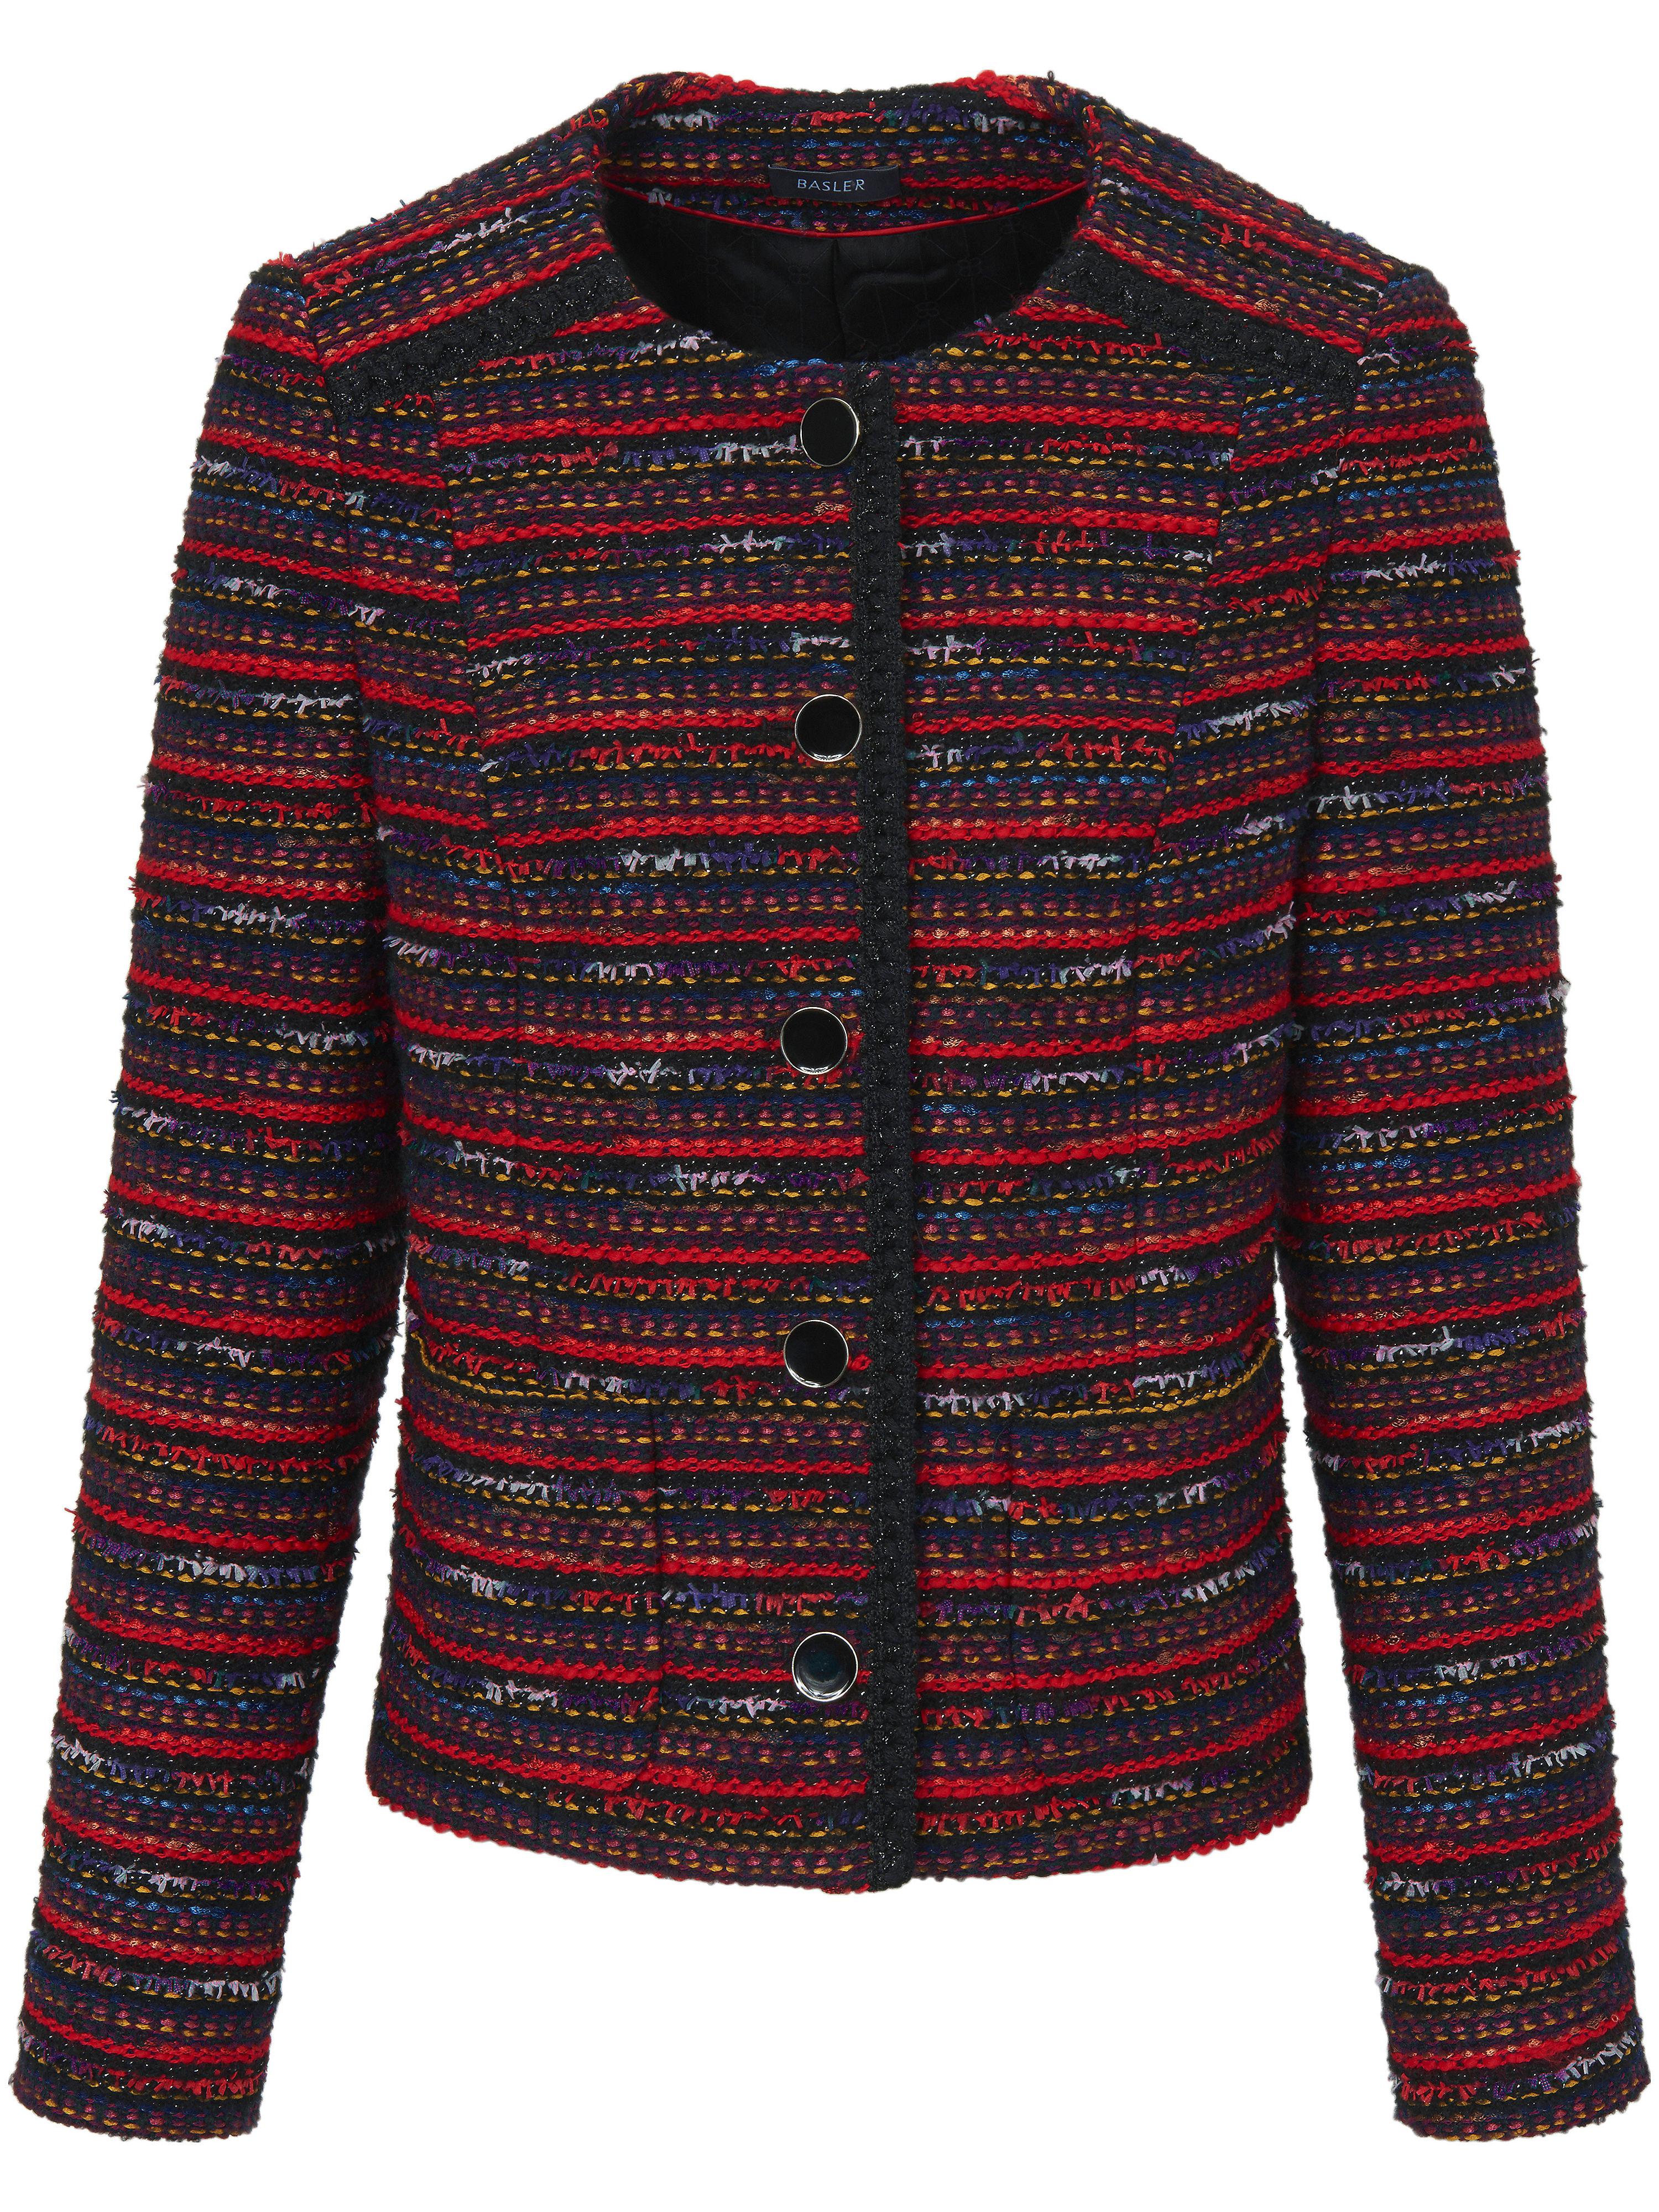 La veste  Basler multicolore taille 50